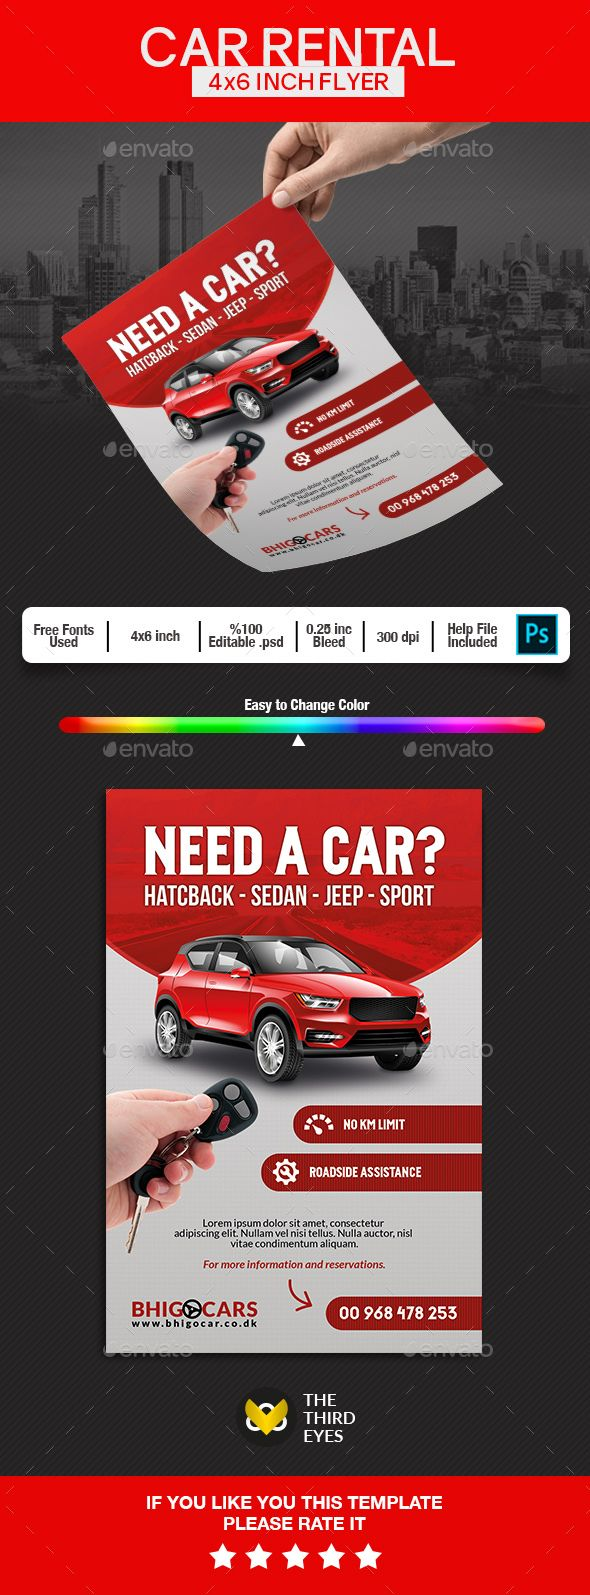 Car Rental Flyer Car rental, Flyer, Flyer design inspiration